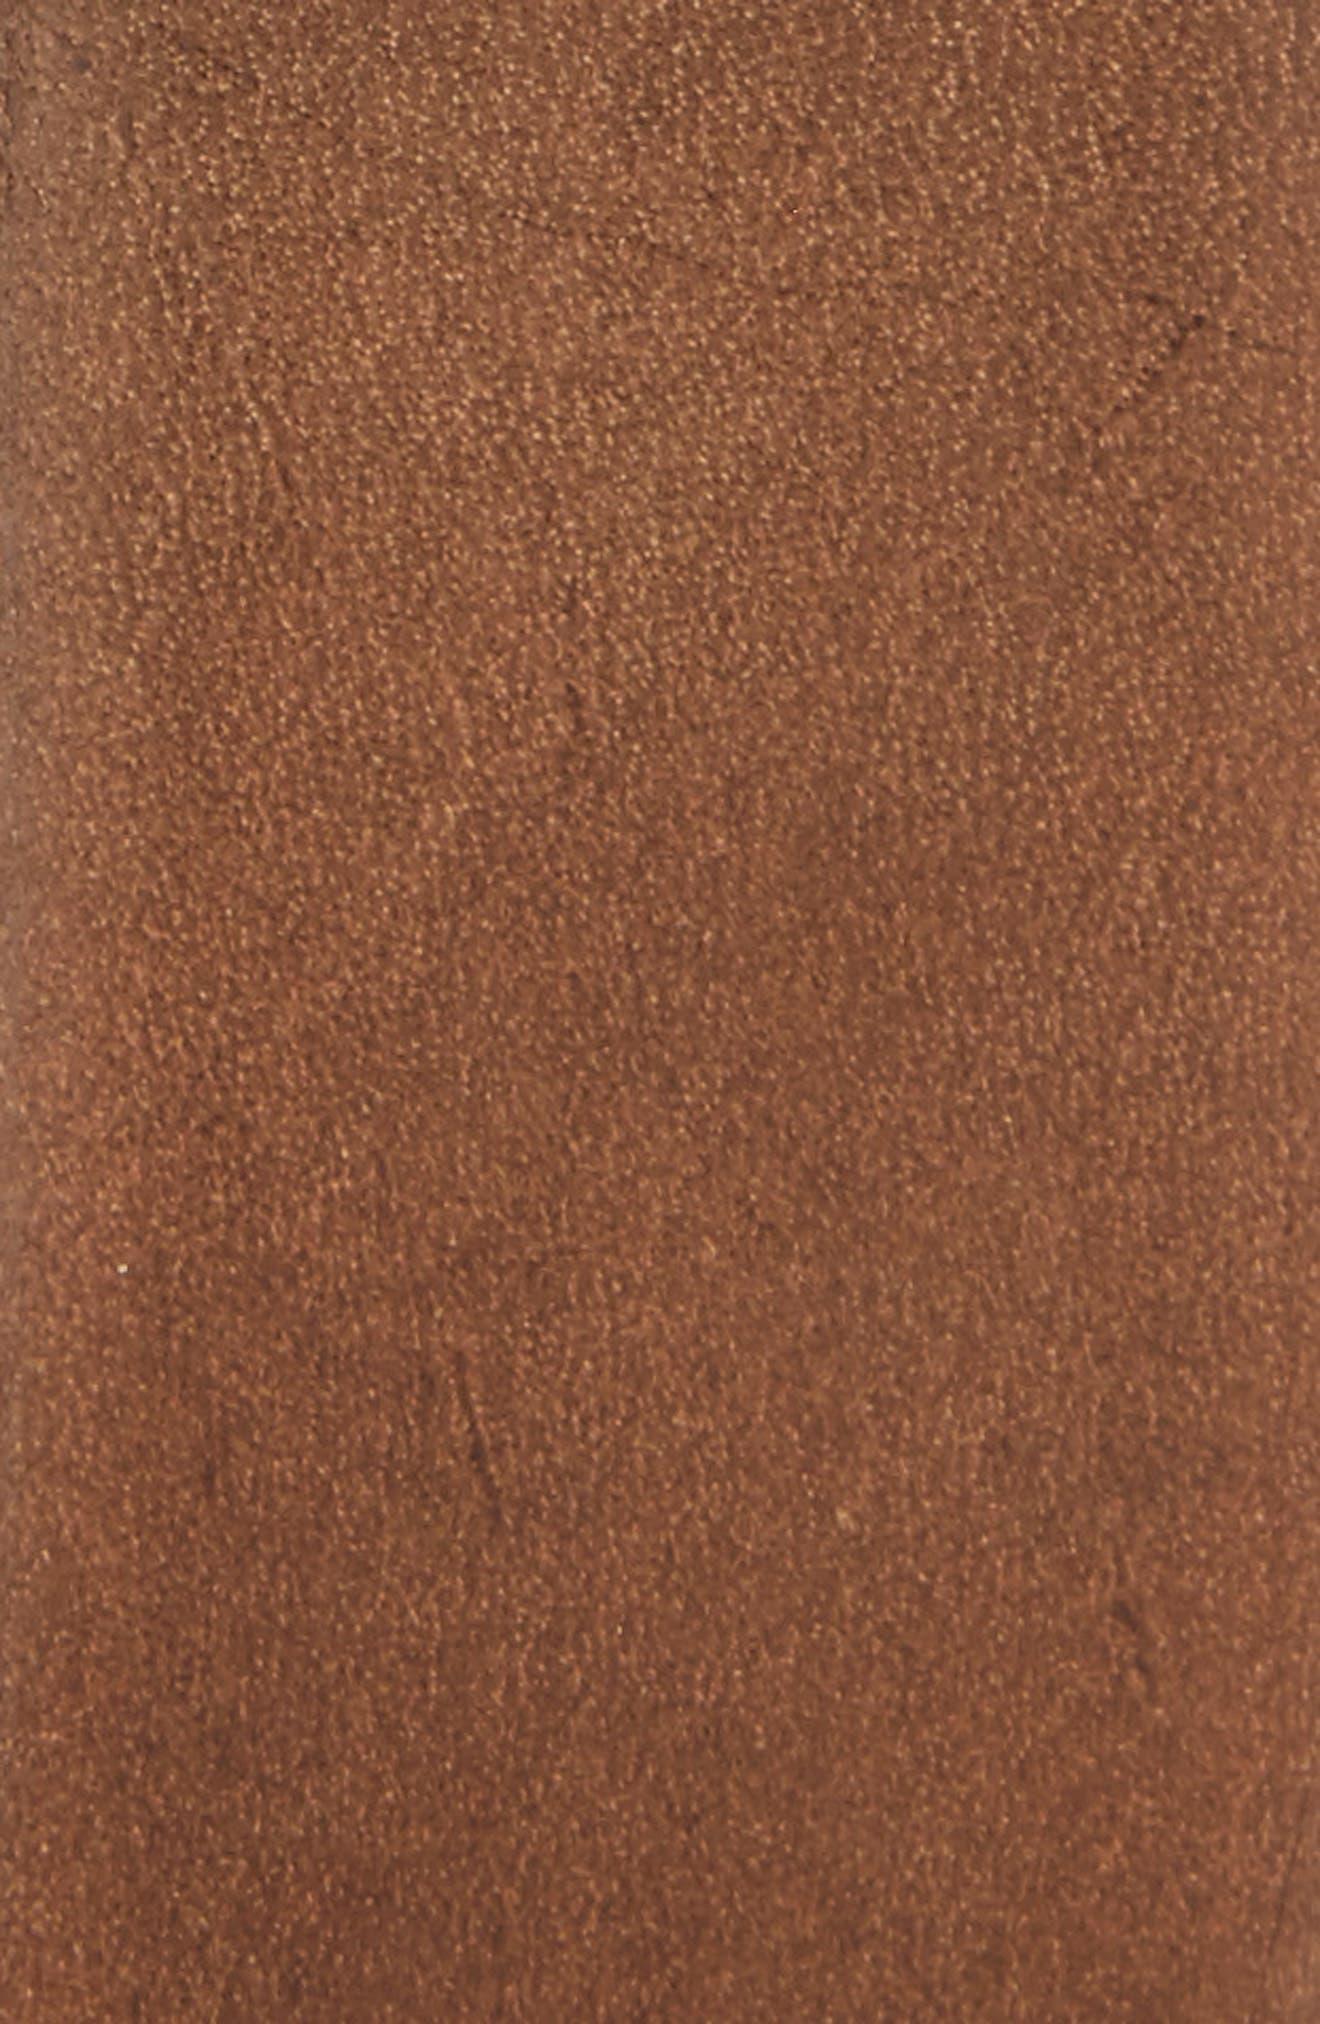 Lorenzo Leather Belt,                             Alternate thumbnail 2, color,                             210